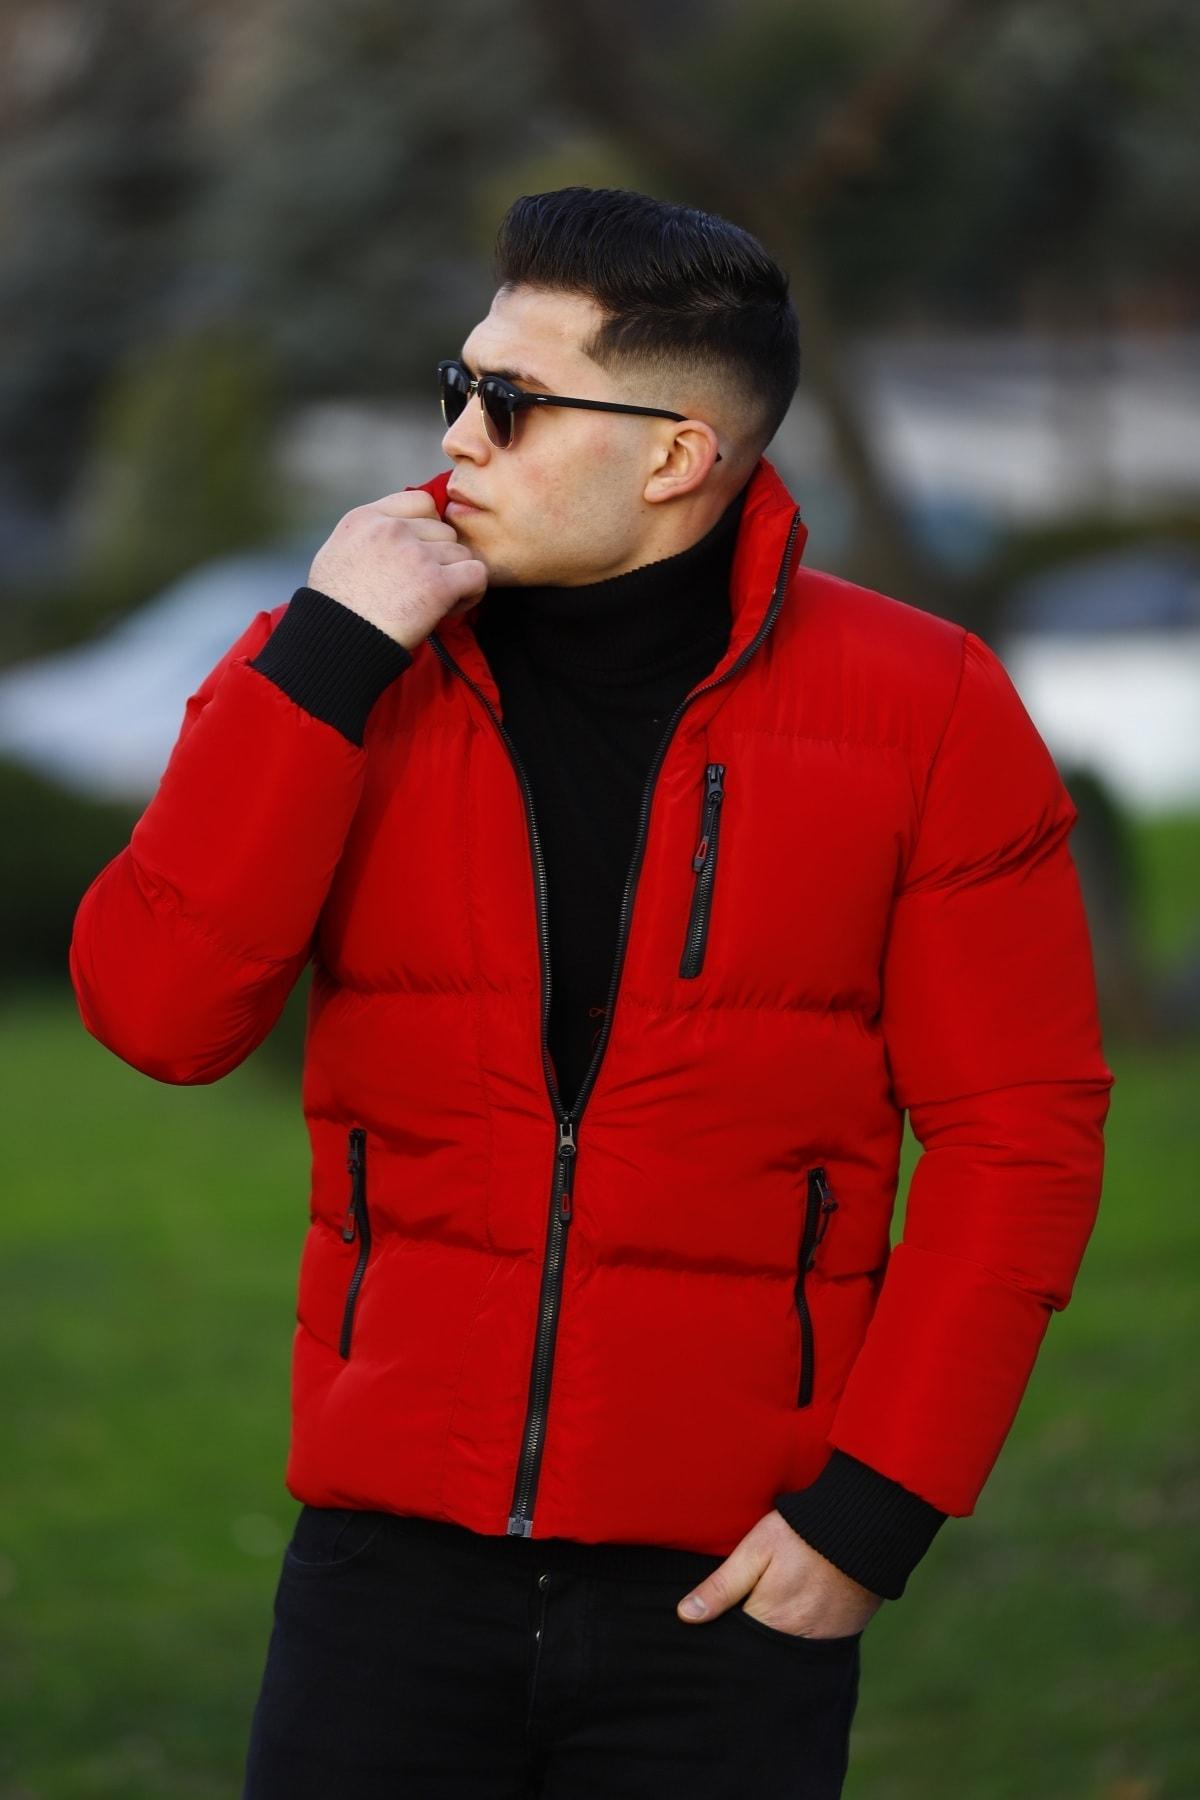 WOWA COMPANY Erkek Kırmızı Şişme Mont 1